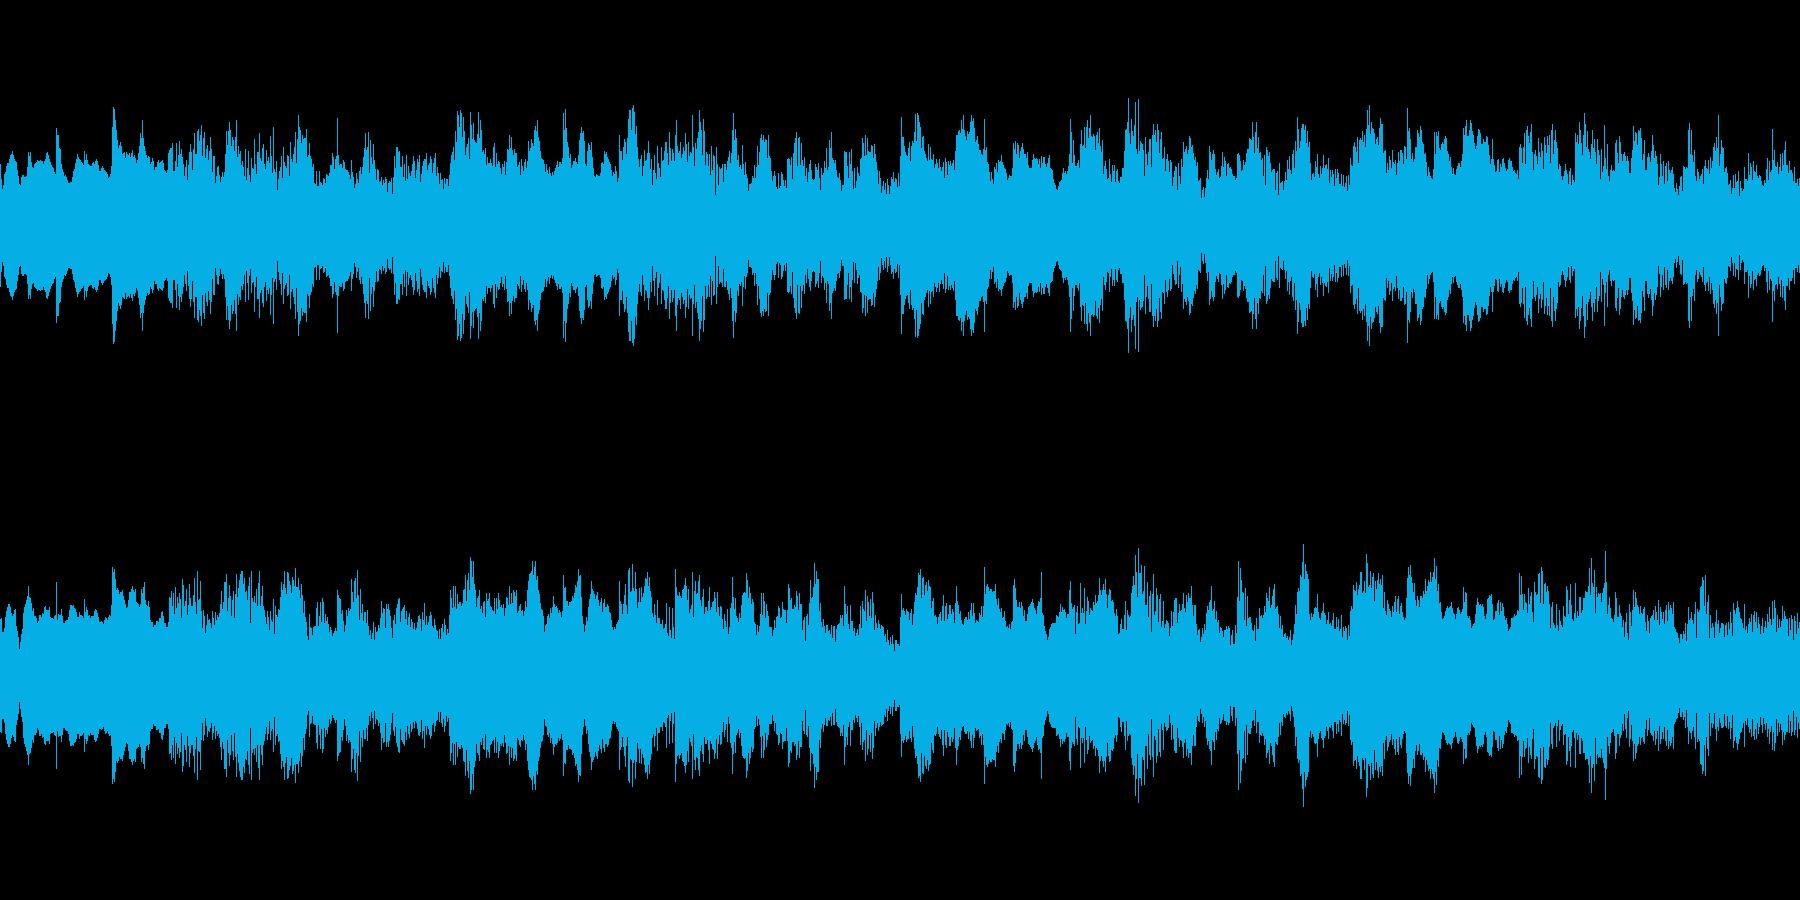 【Loop】クリスタルヒーリングの再生済みの波形